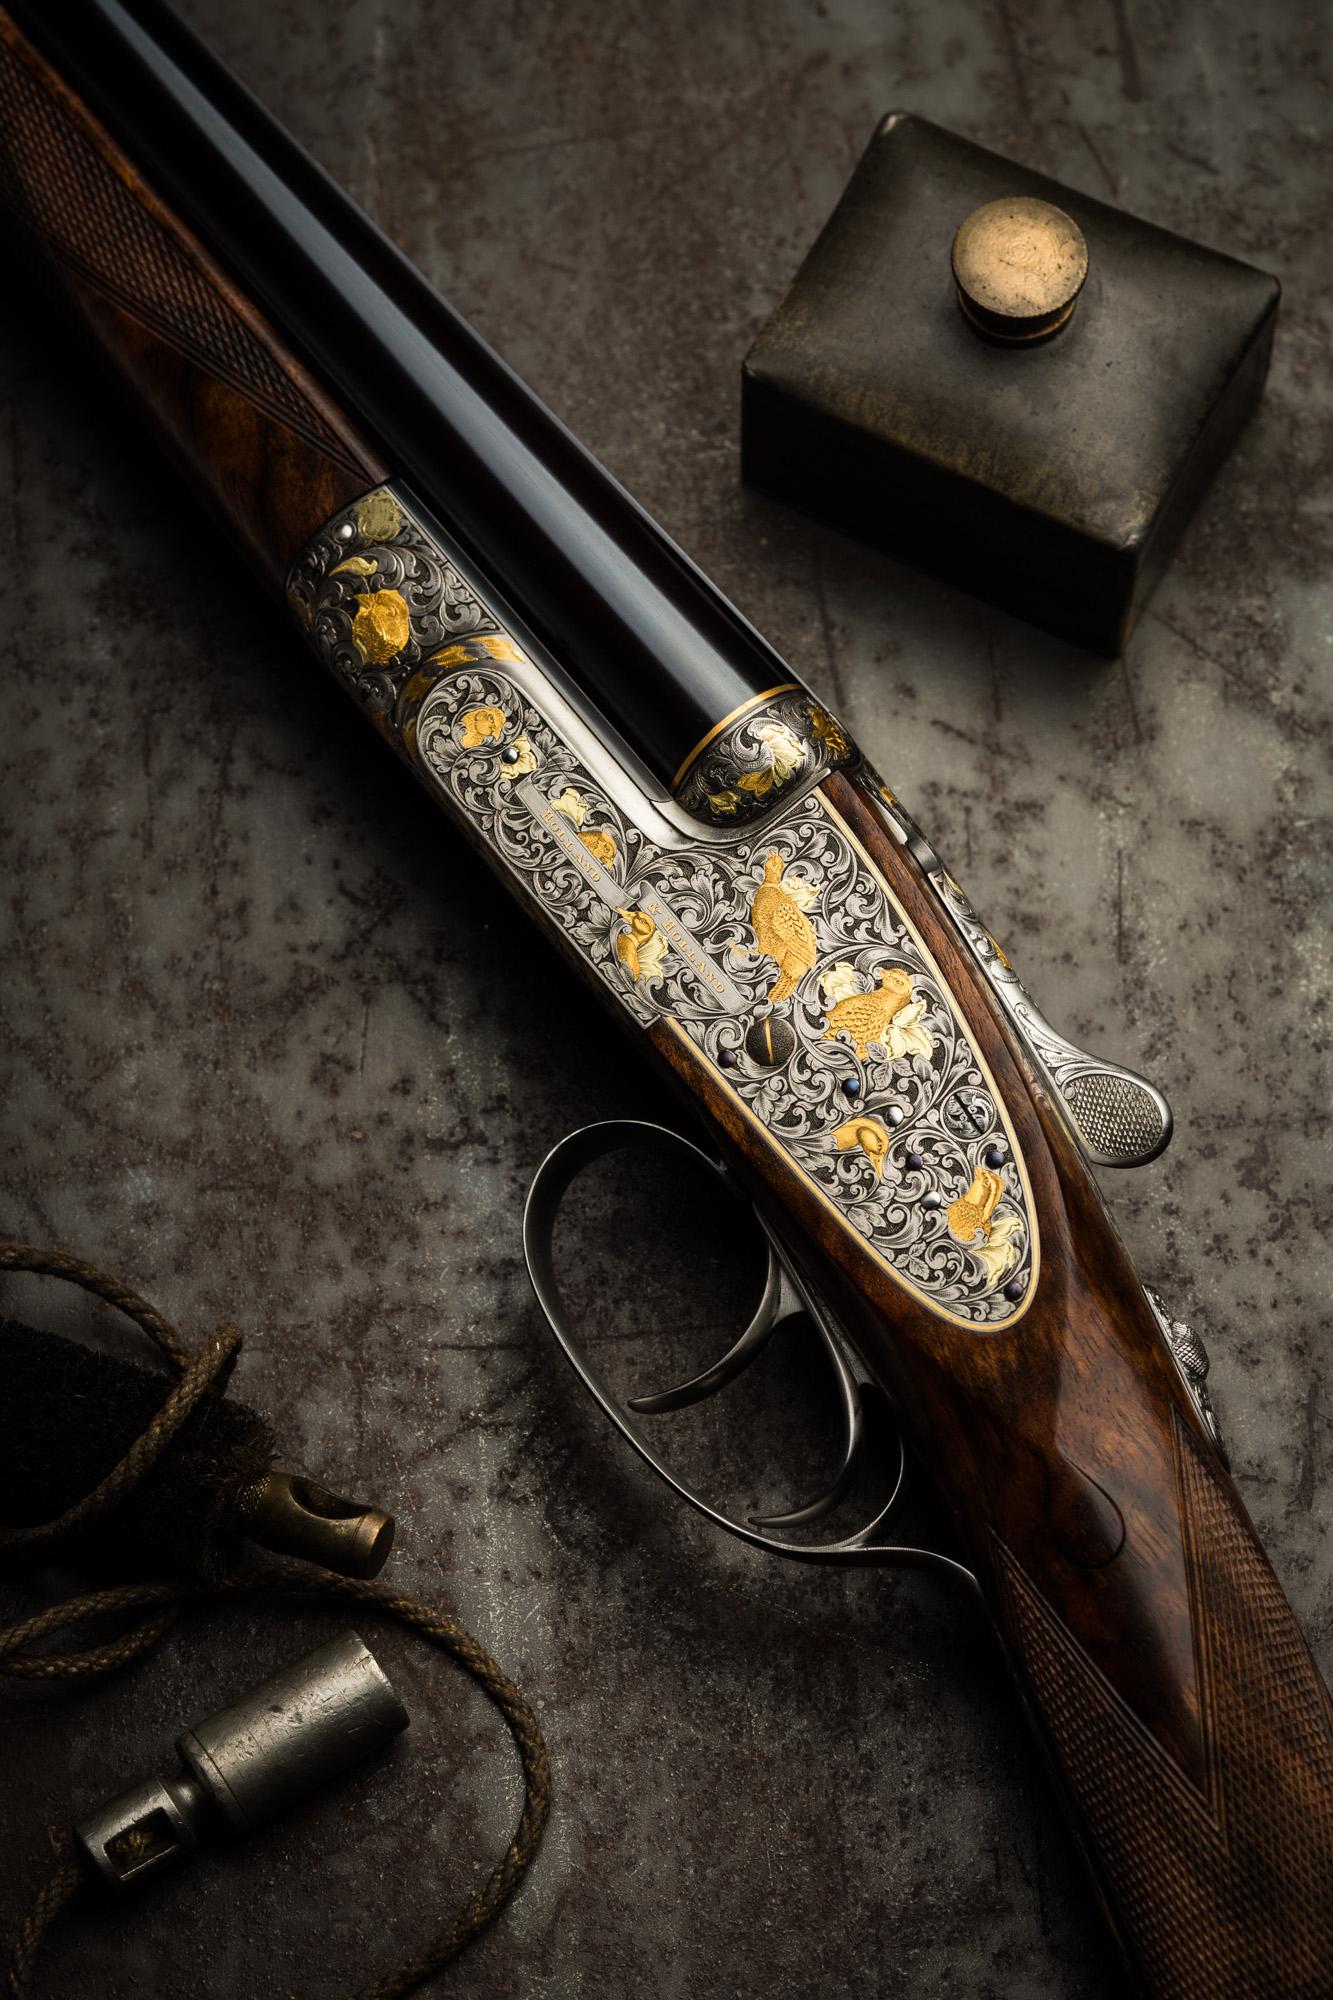 Holland & Holland, Coggan, Royal Deluxe, 28g, shotguns, pair,